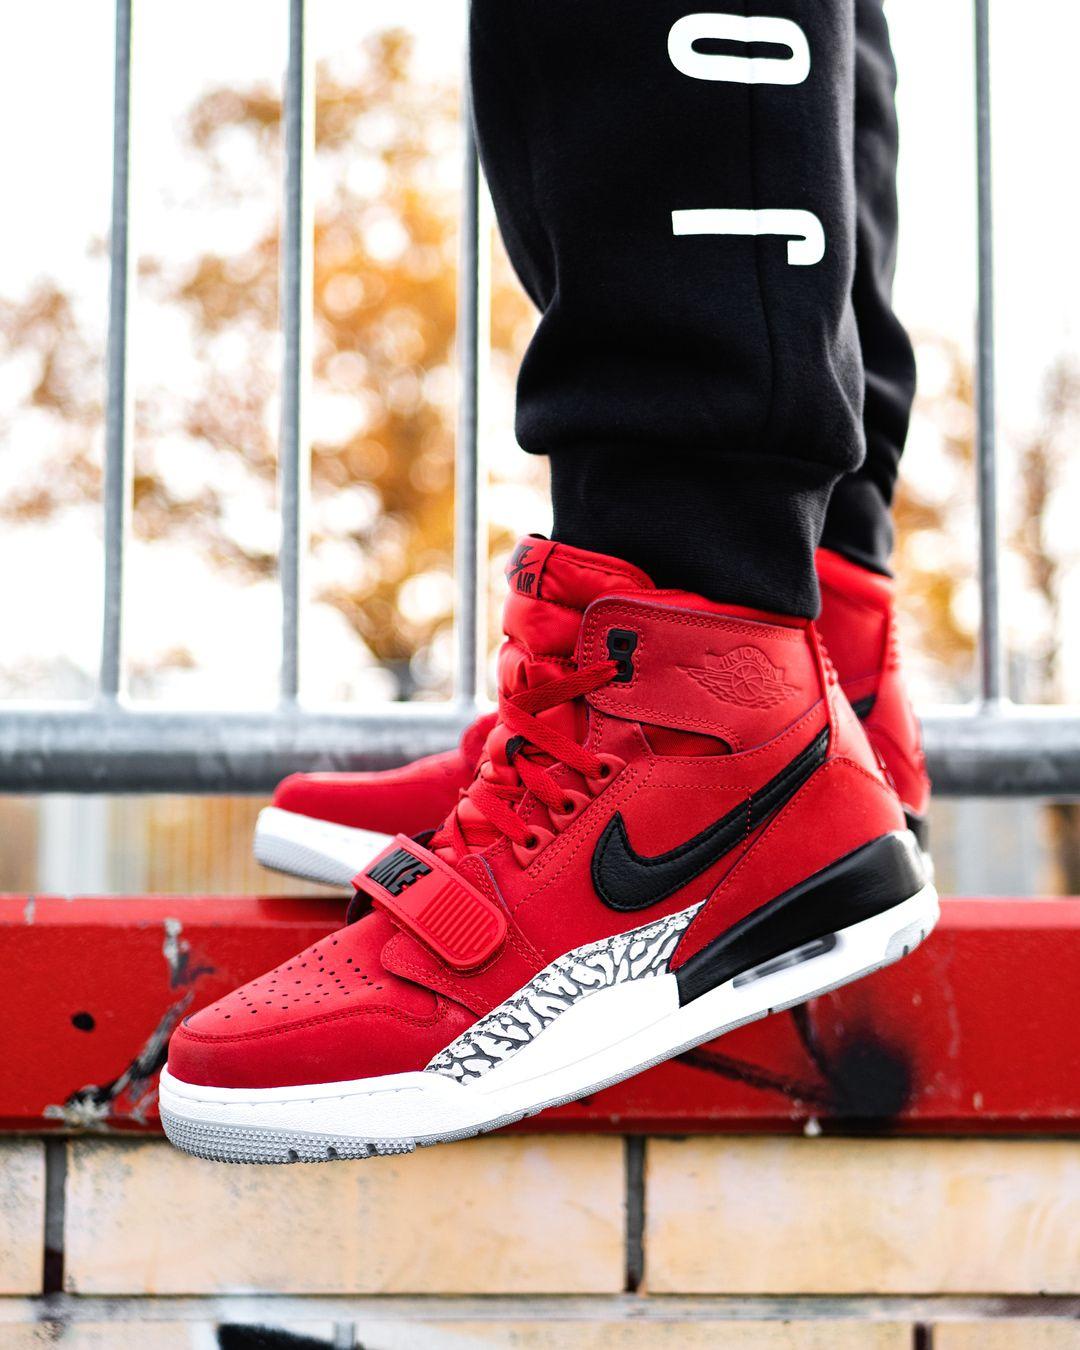 Nike Air Jordan Legacy 312 Turnschuhe Nike Jordan Schuhe Turnschuhe Nike